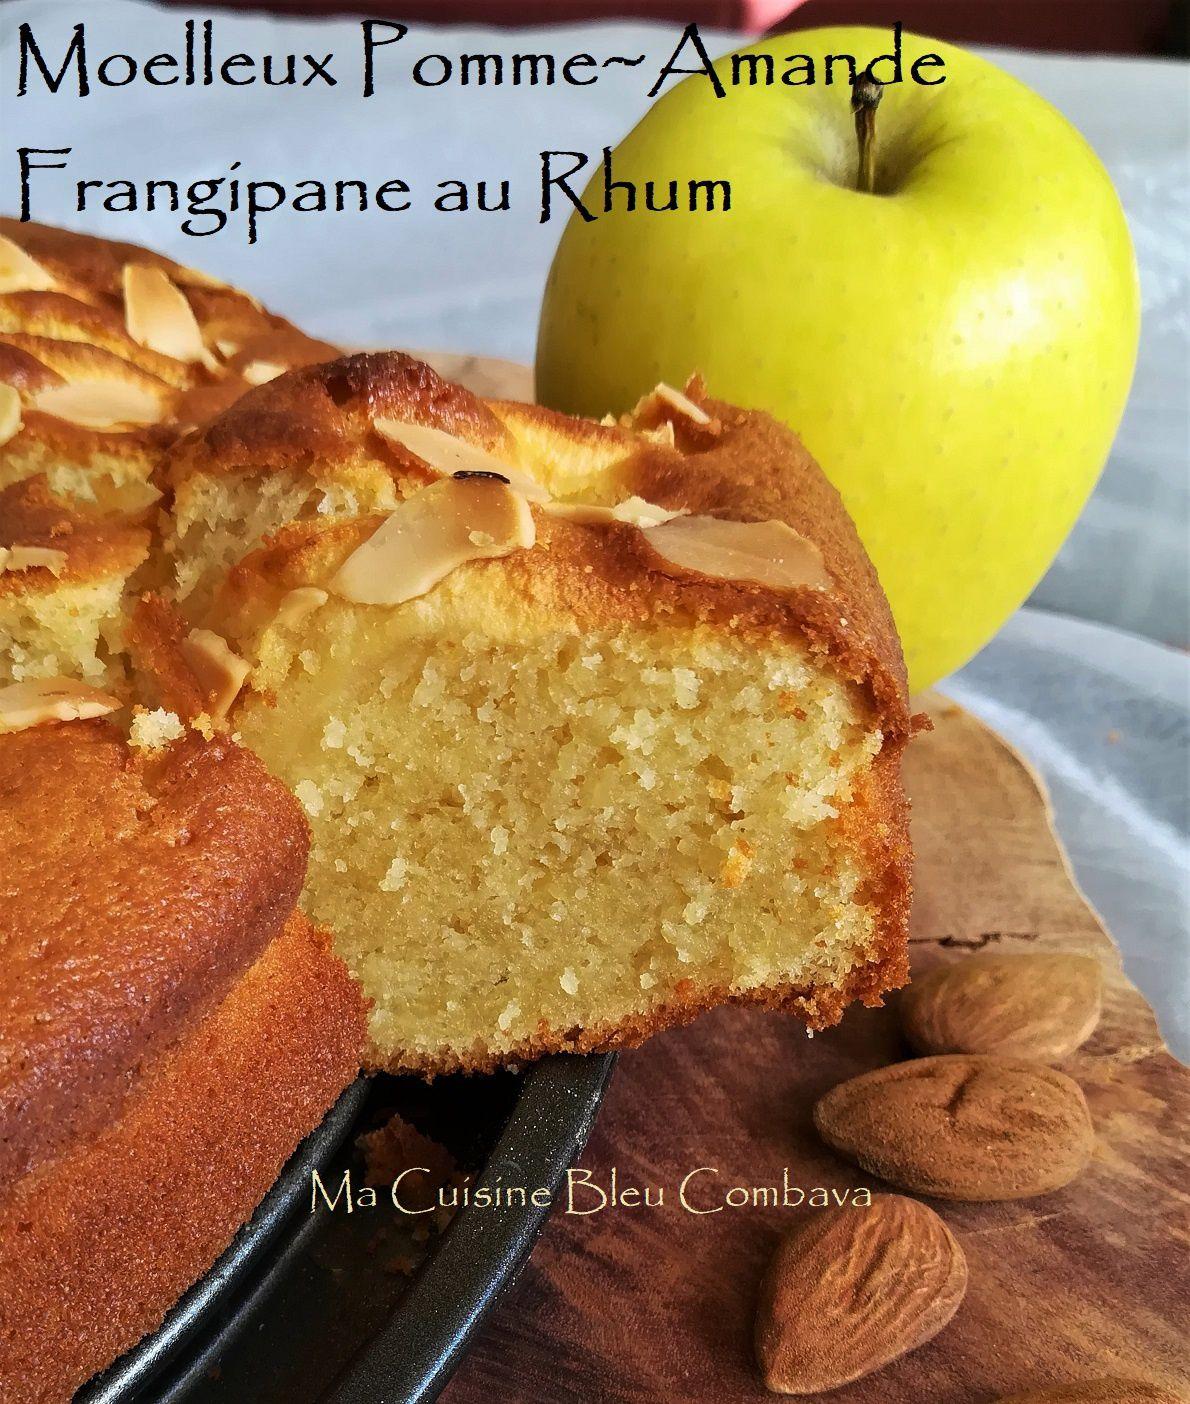 Moelleux Pomme~Amande & Frangipane au Rhum